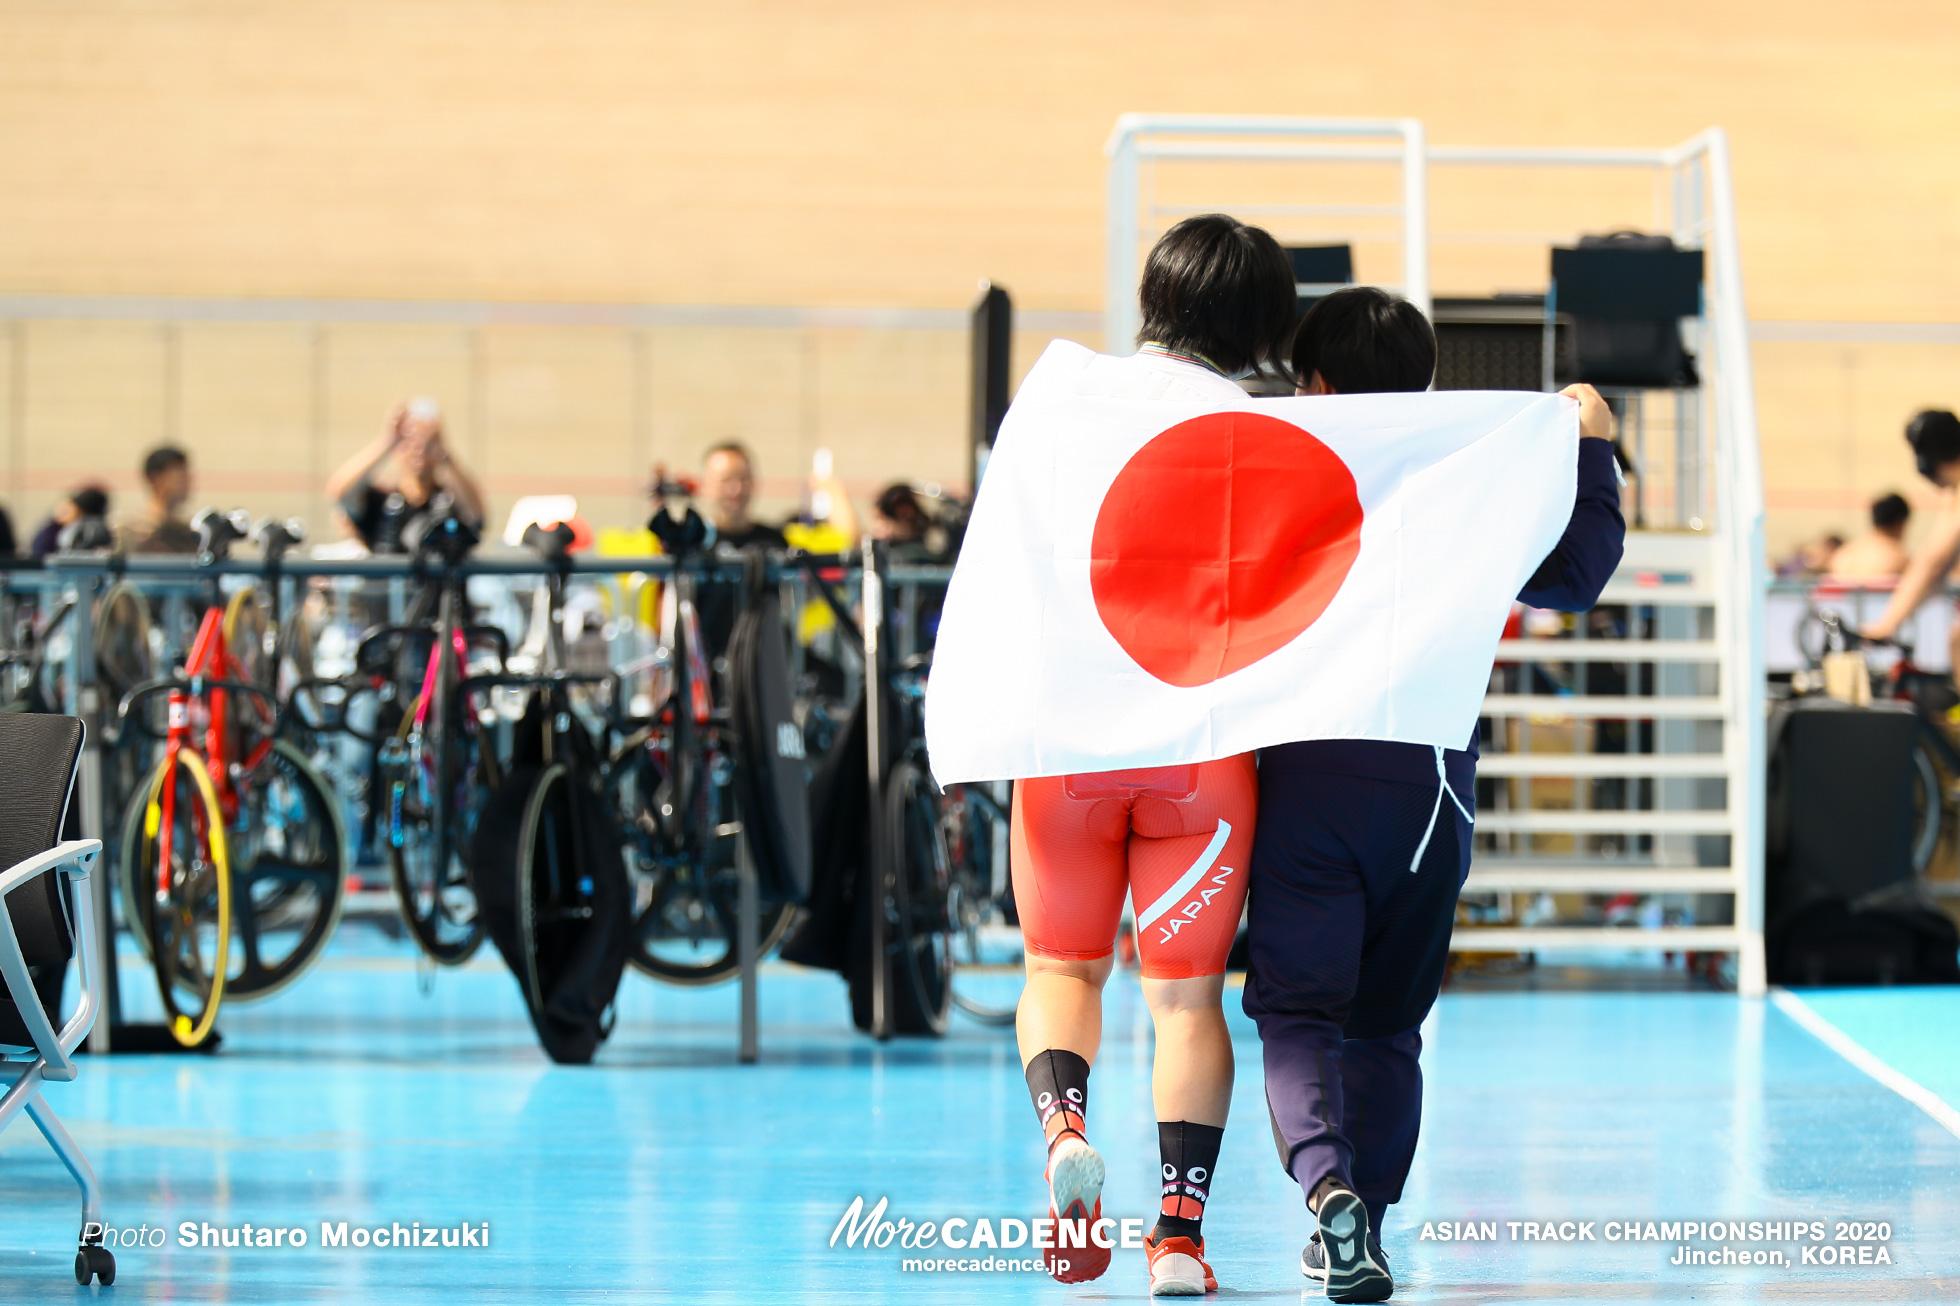 古山稀絵 Women Scratch Race / ASIAN TRACK CHAMPIONSHIPS 2020